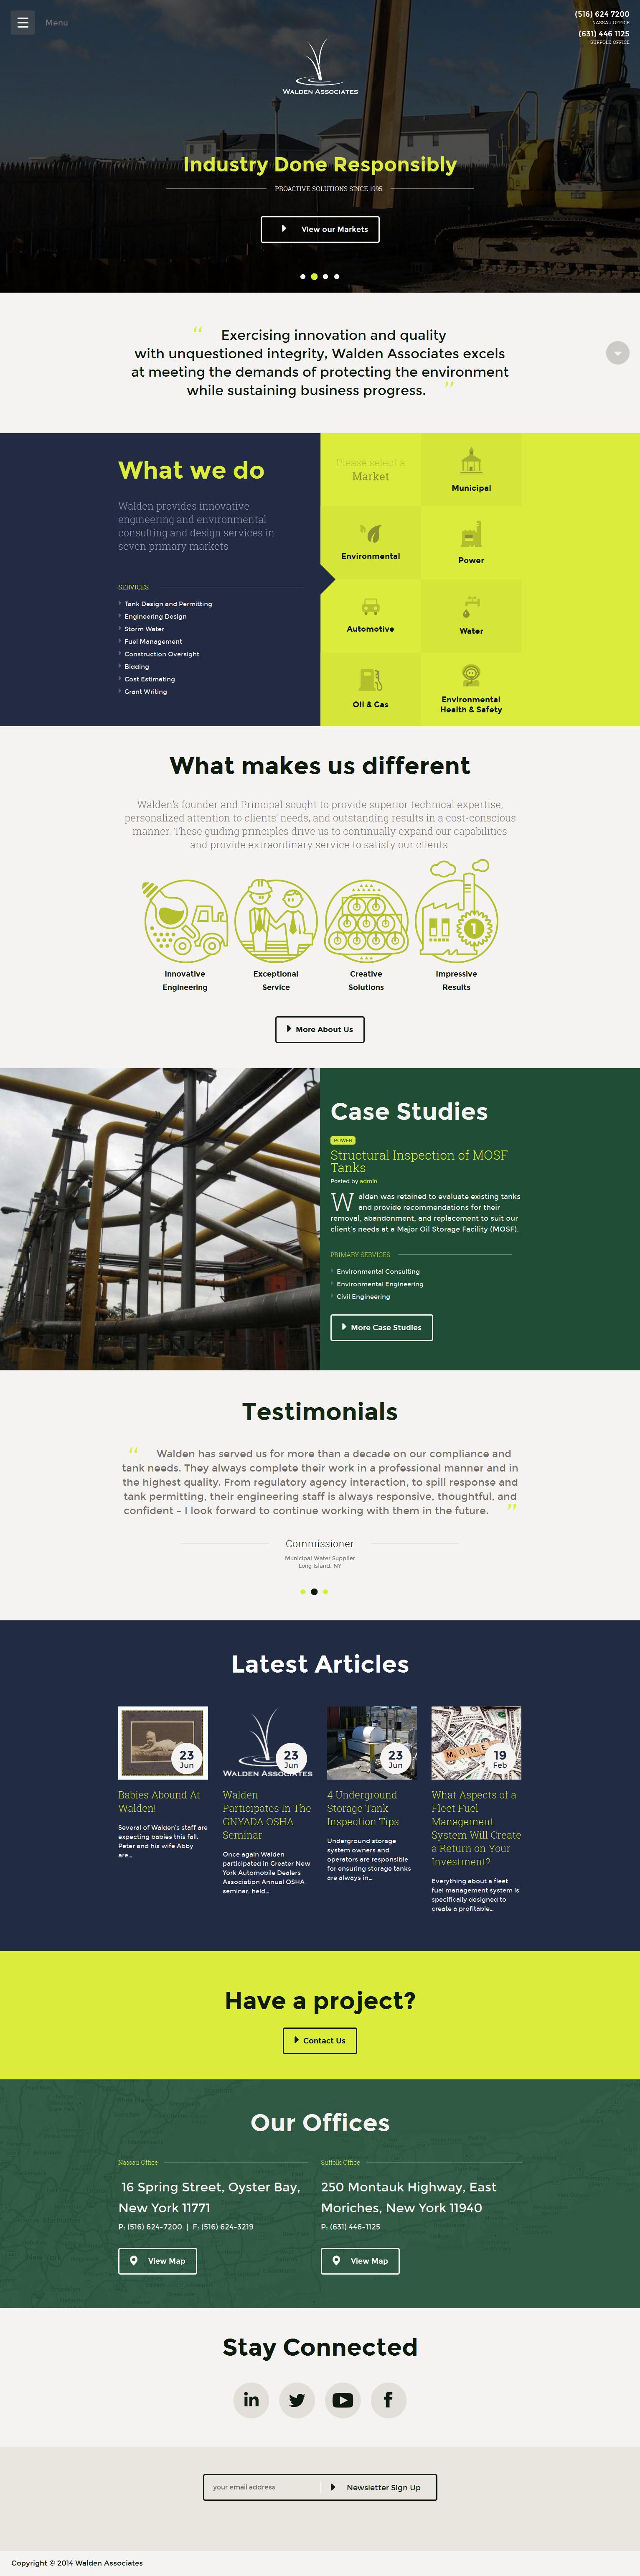 Walden Associates Website Design And Illustration Work By Www Isadoradesign Com Web Development Design Web Layout Design Web Design Inspiration